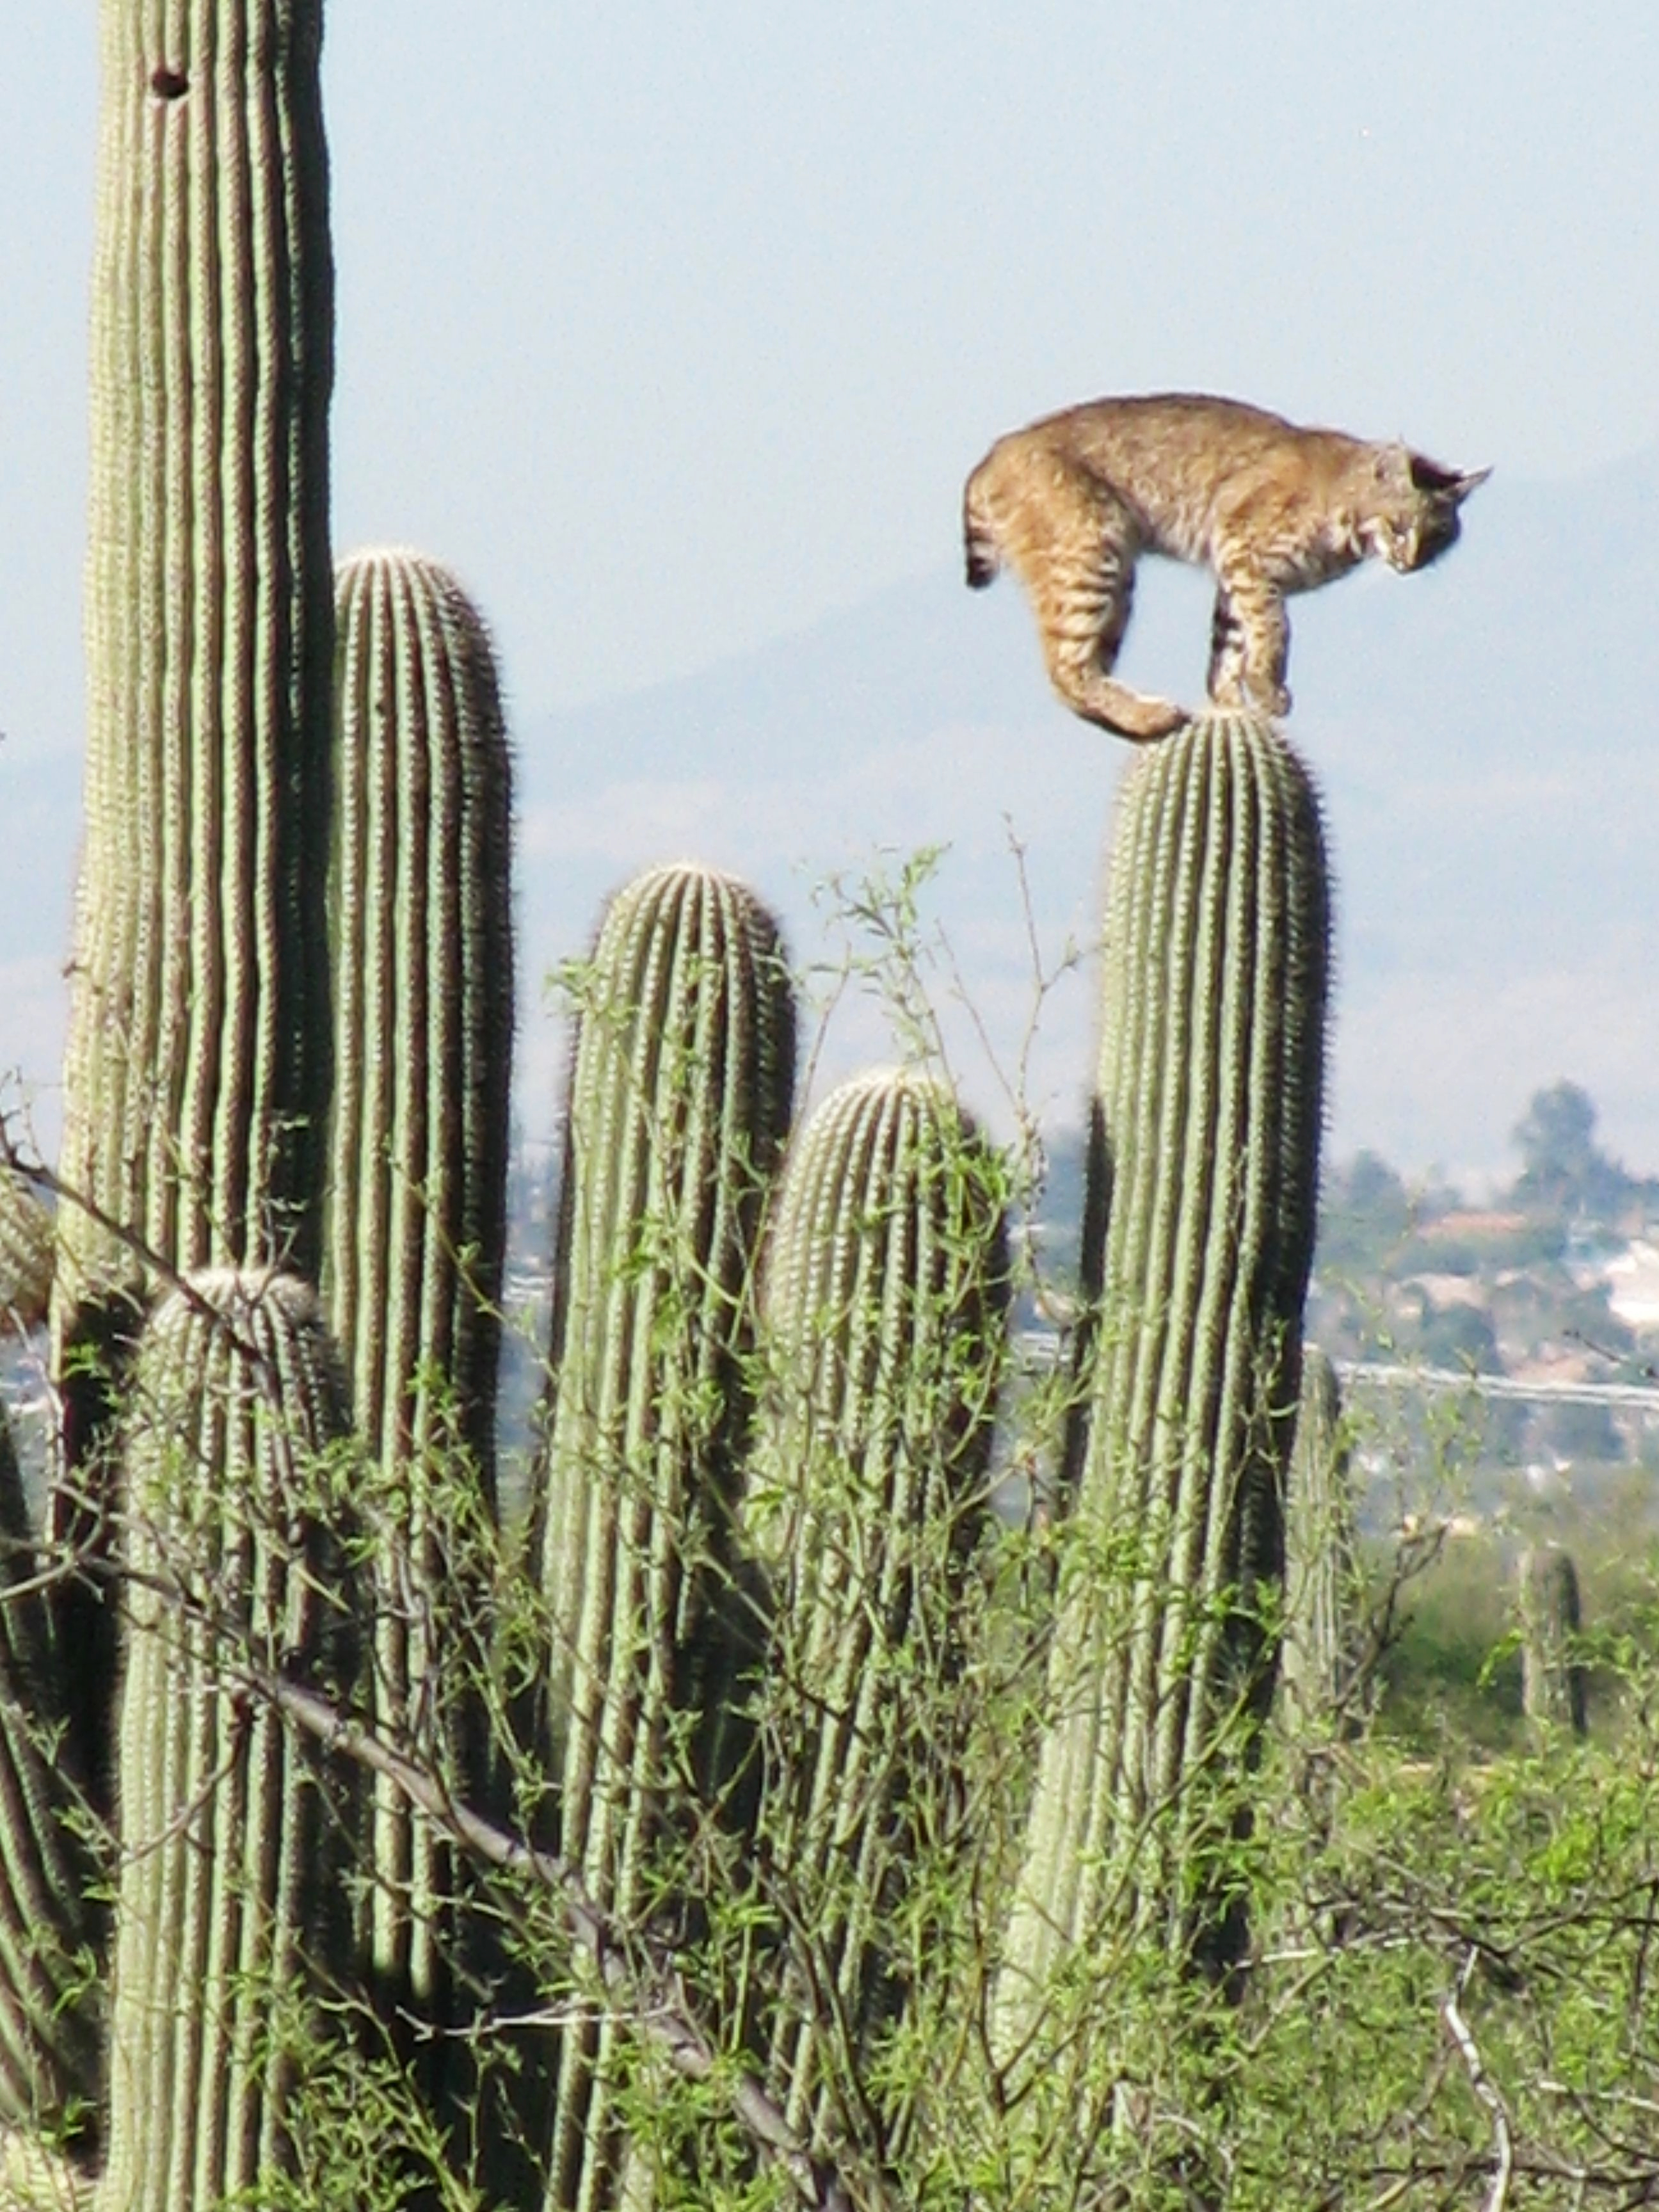 Many animals make saguaros their home